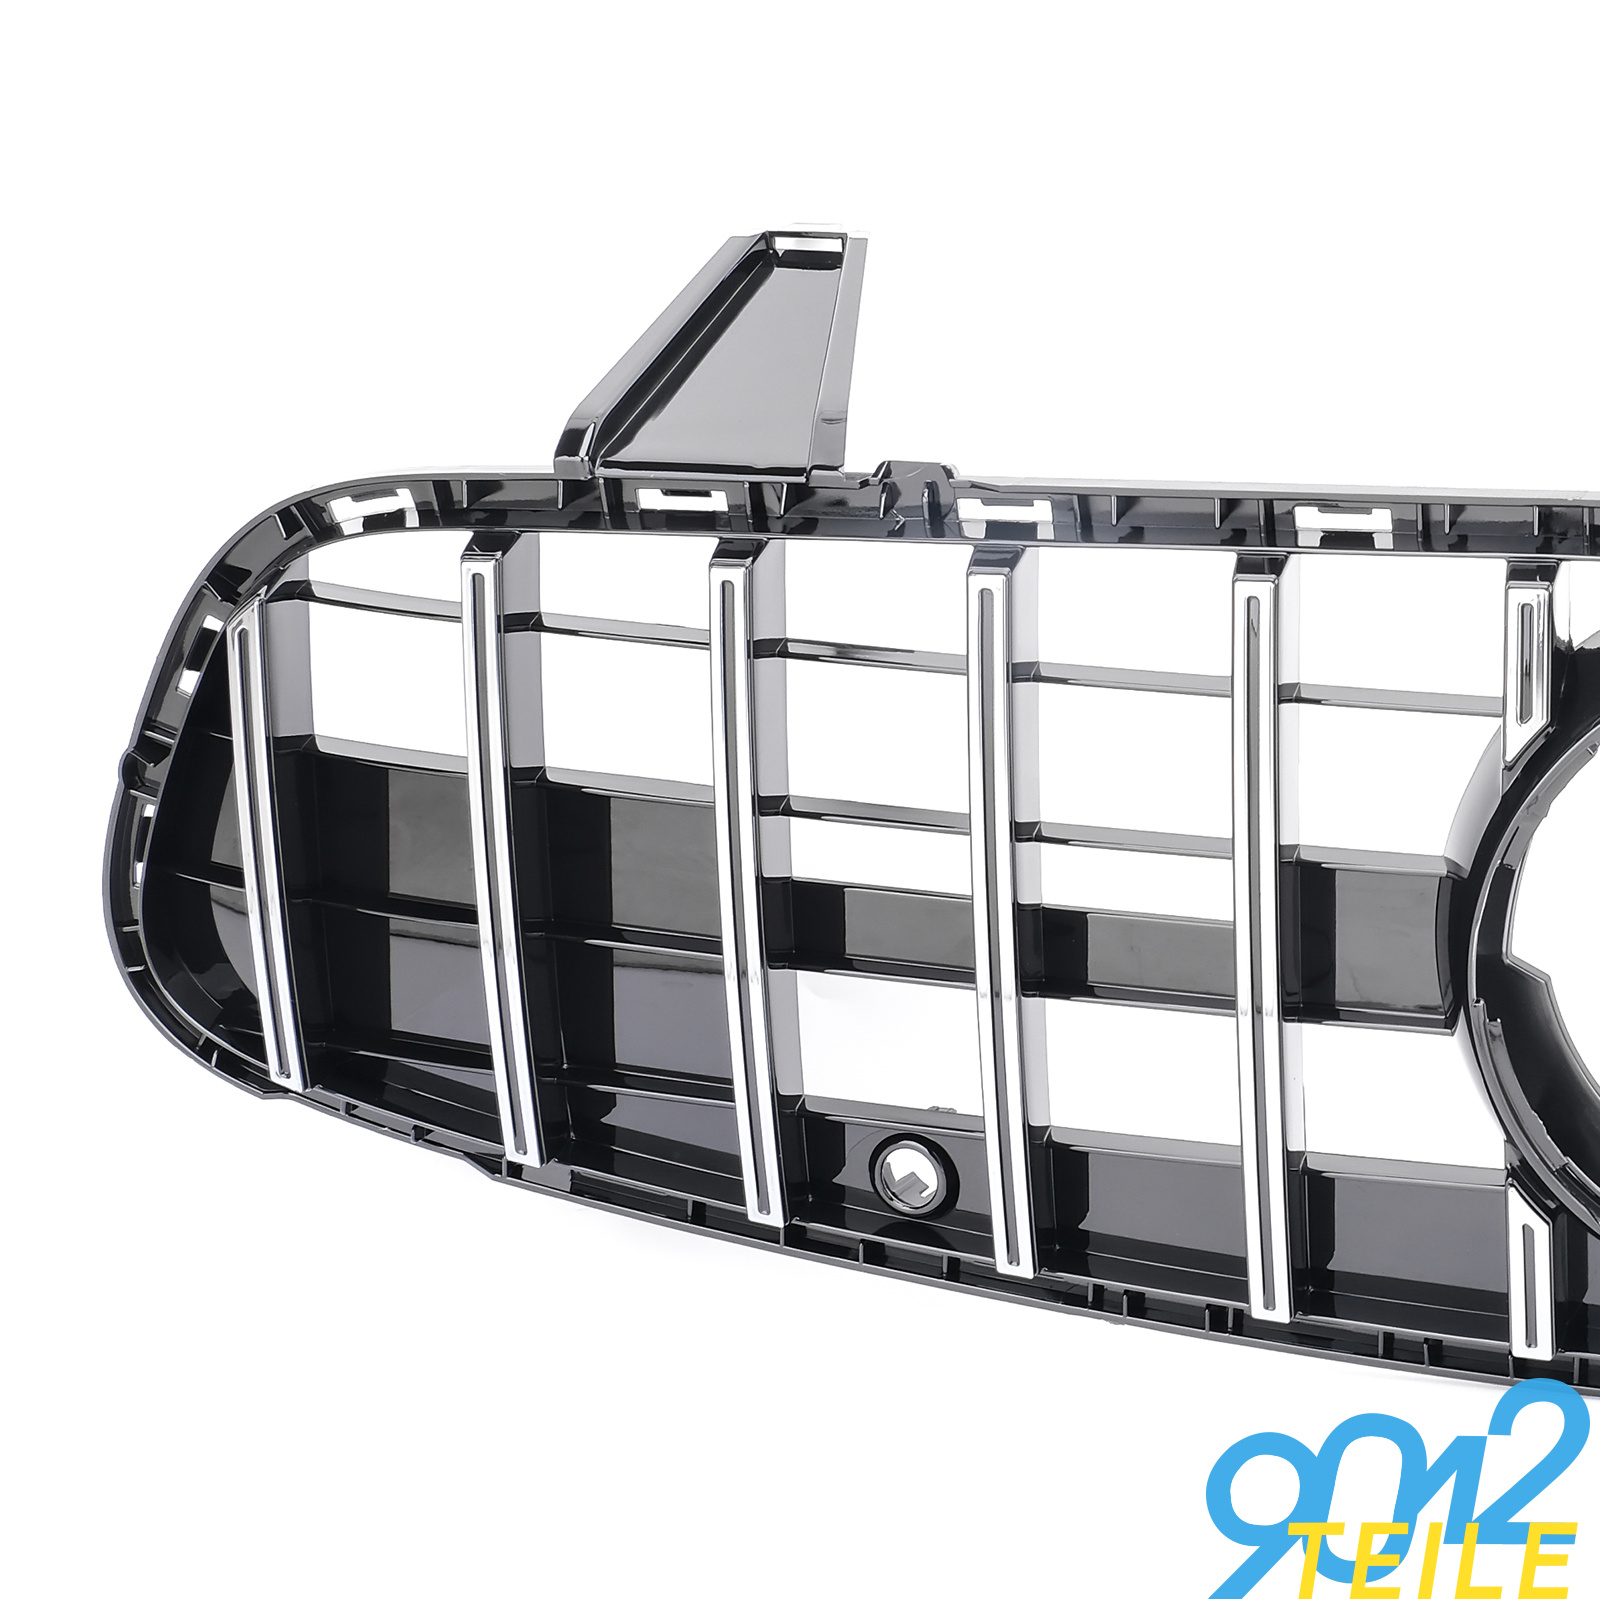 fuer-Mercedes-GT-LOOK-Grill-SL-Klasse-R231-W231-GLANZ-CHROM-Frontgrill-ab-2016 Indexbild 2